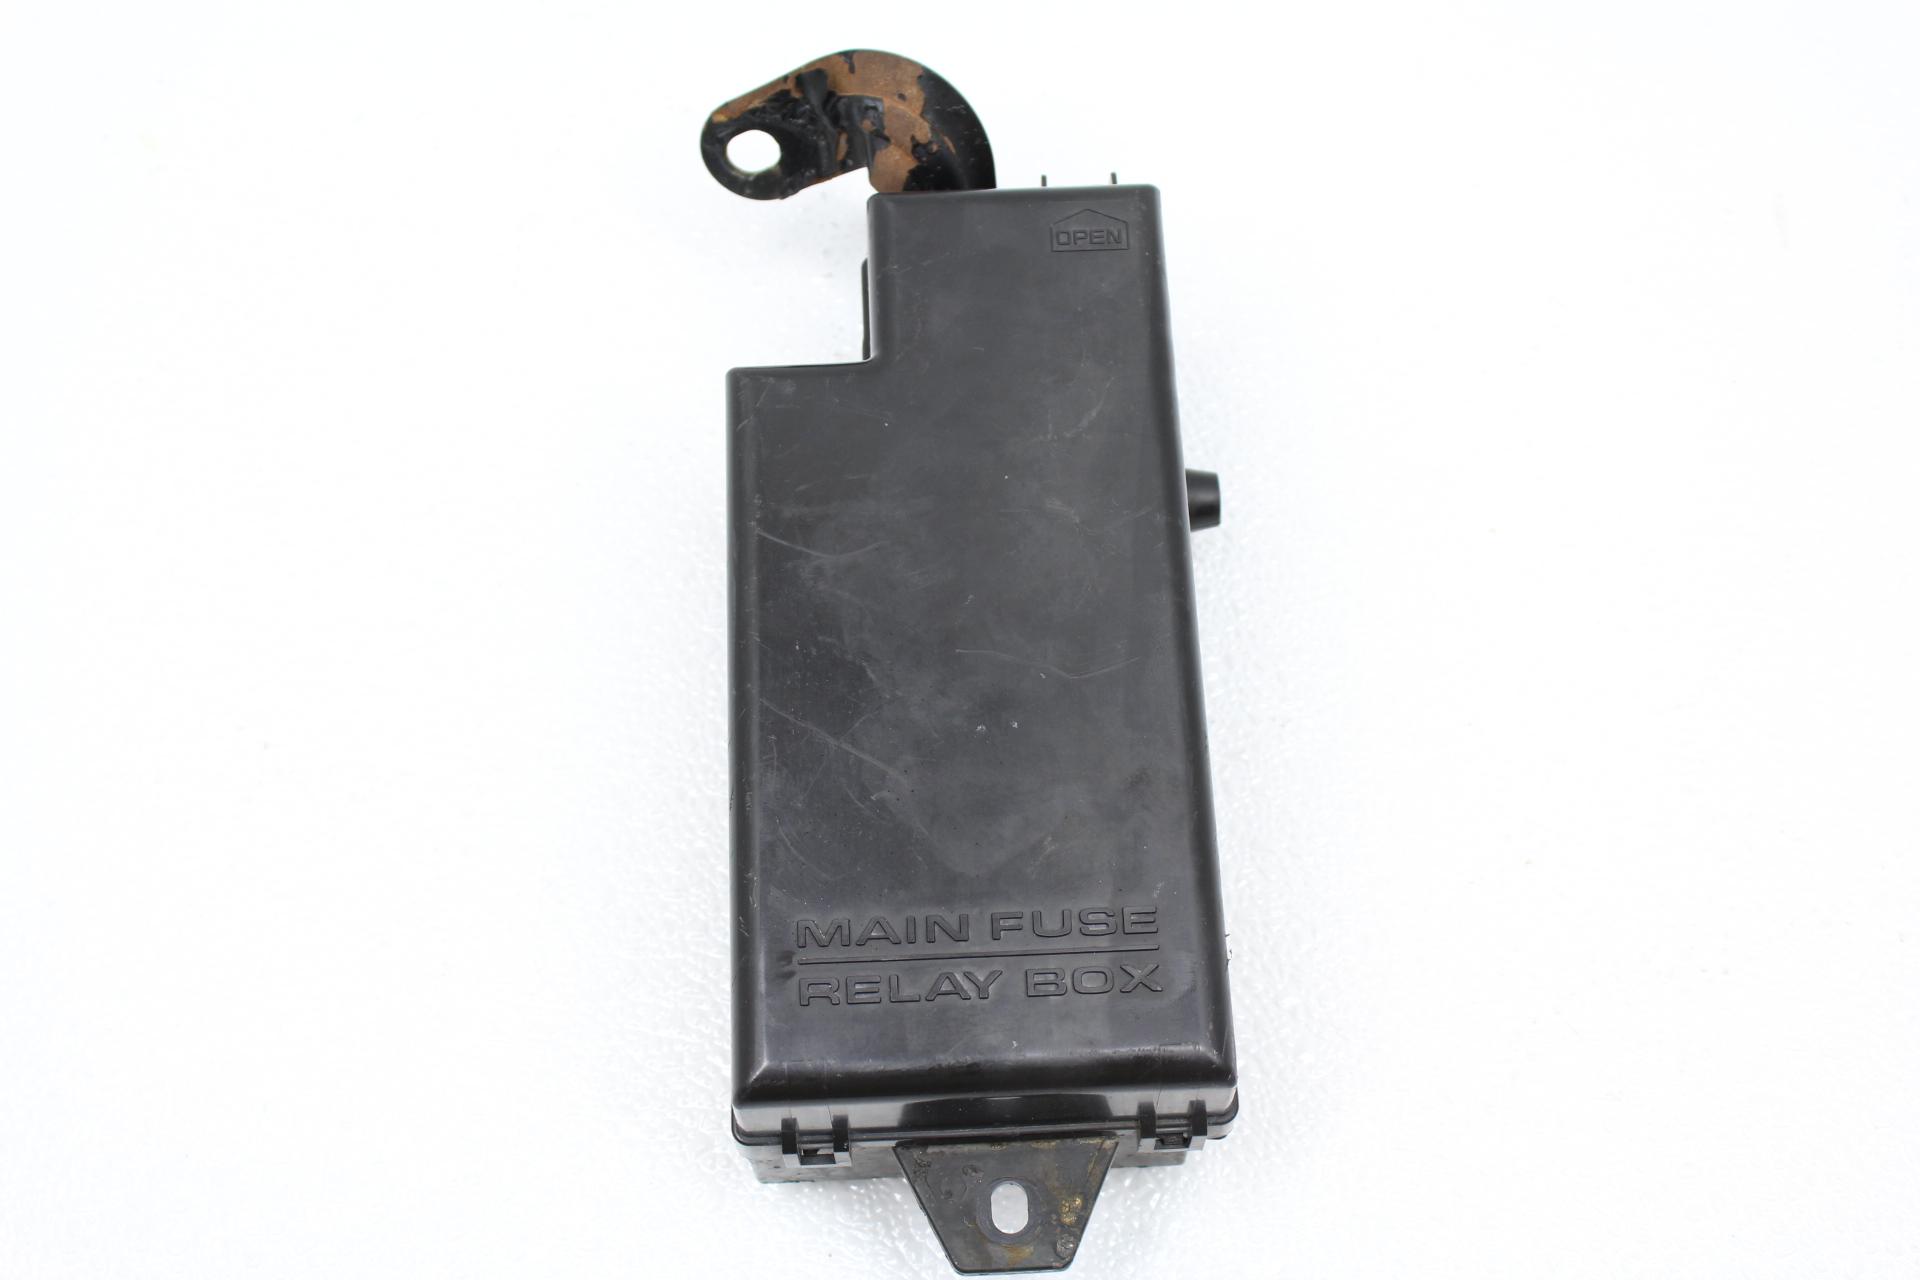 hight resolution of 2002 2005 subaru impreza wrx sti engine bay fuse box panel assembly